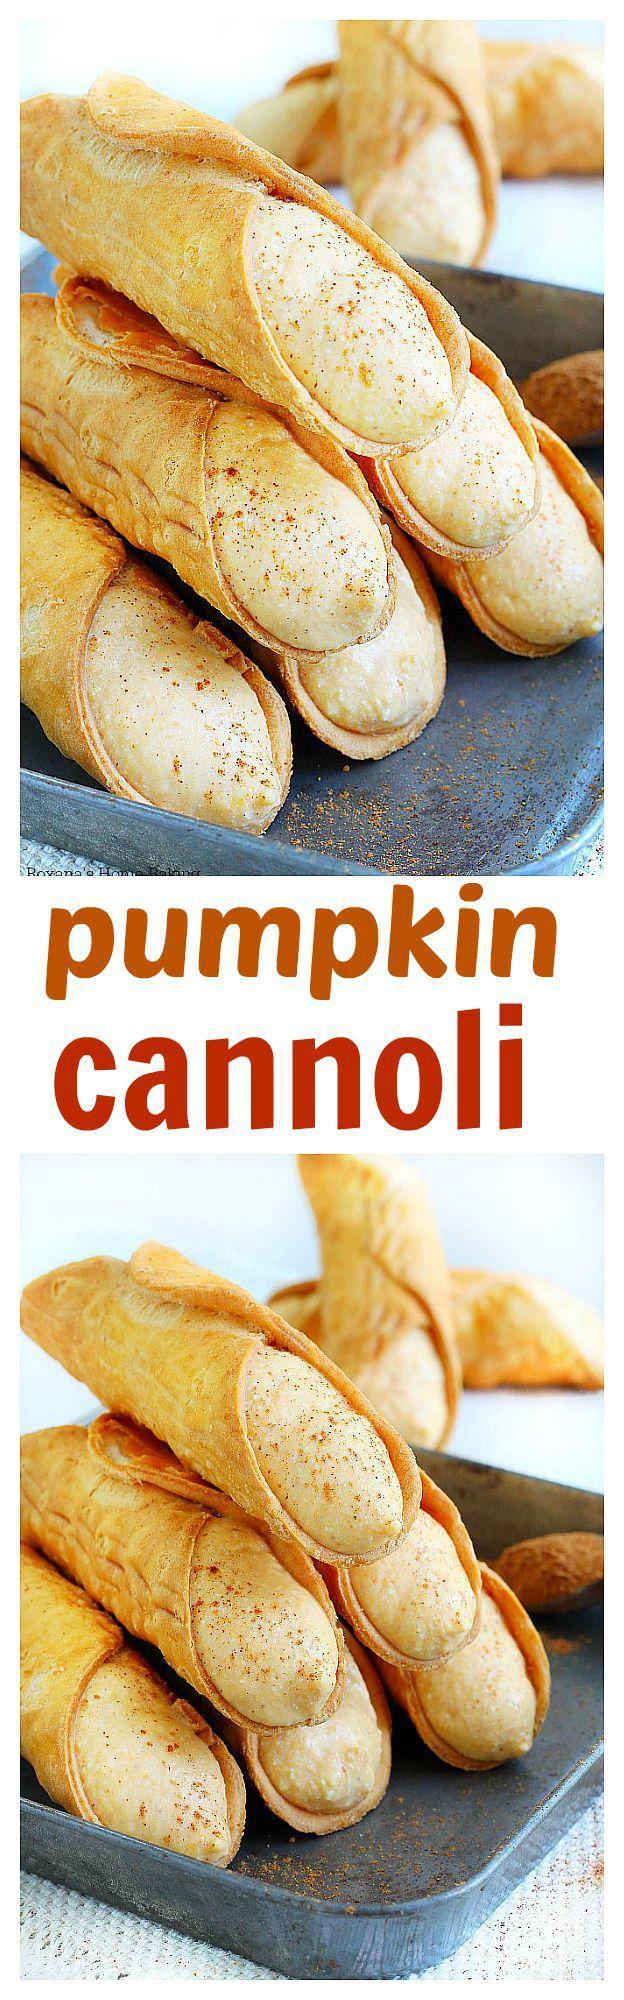 15 Must-see Cannoli Recipe Pins | Cannoli, Cannoli cream ...